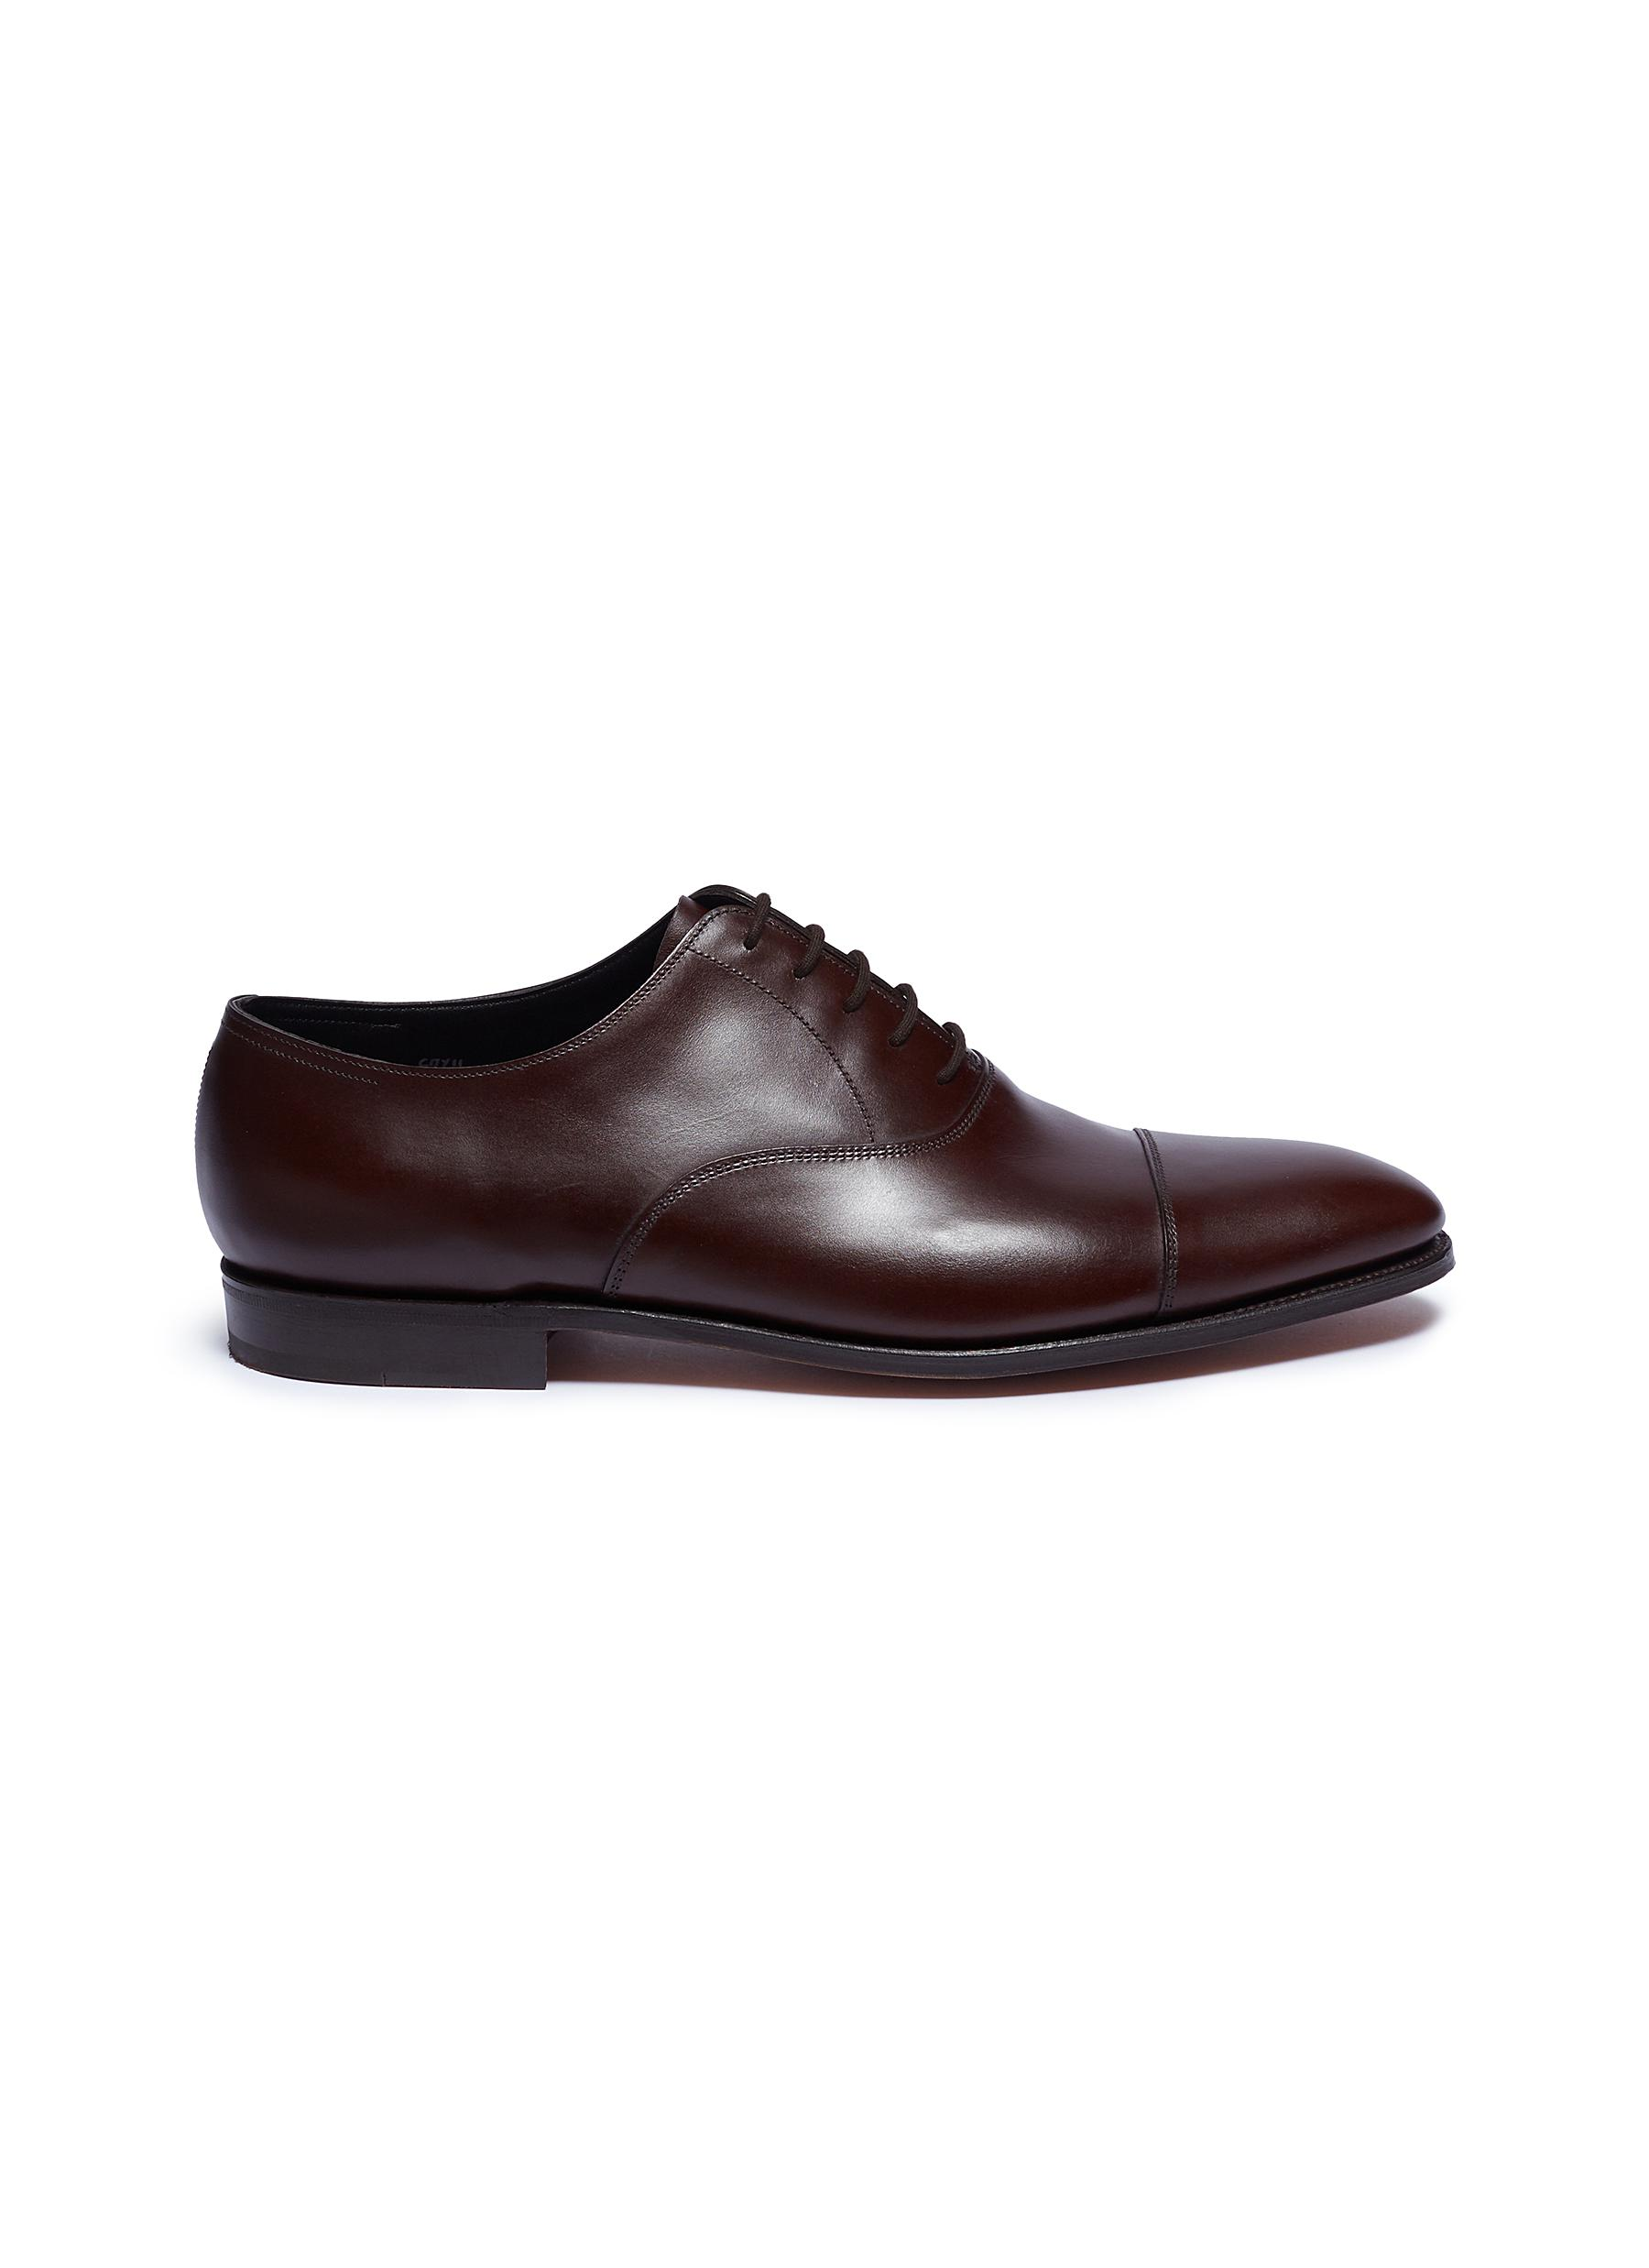 John Lobb Men's Hartland Classic Leather Oxfords In Brown